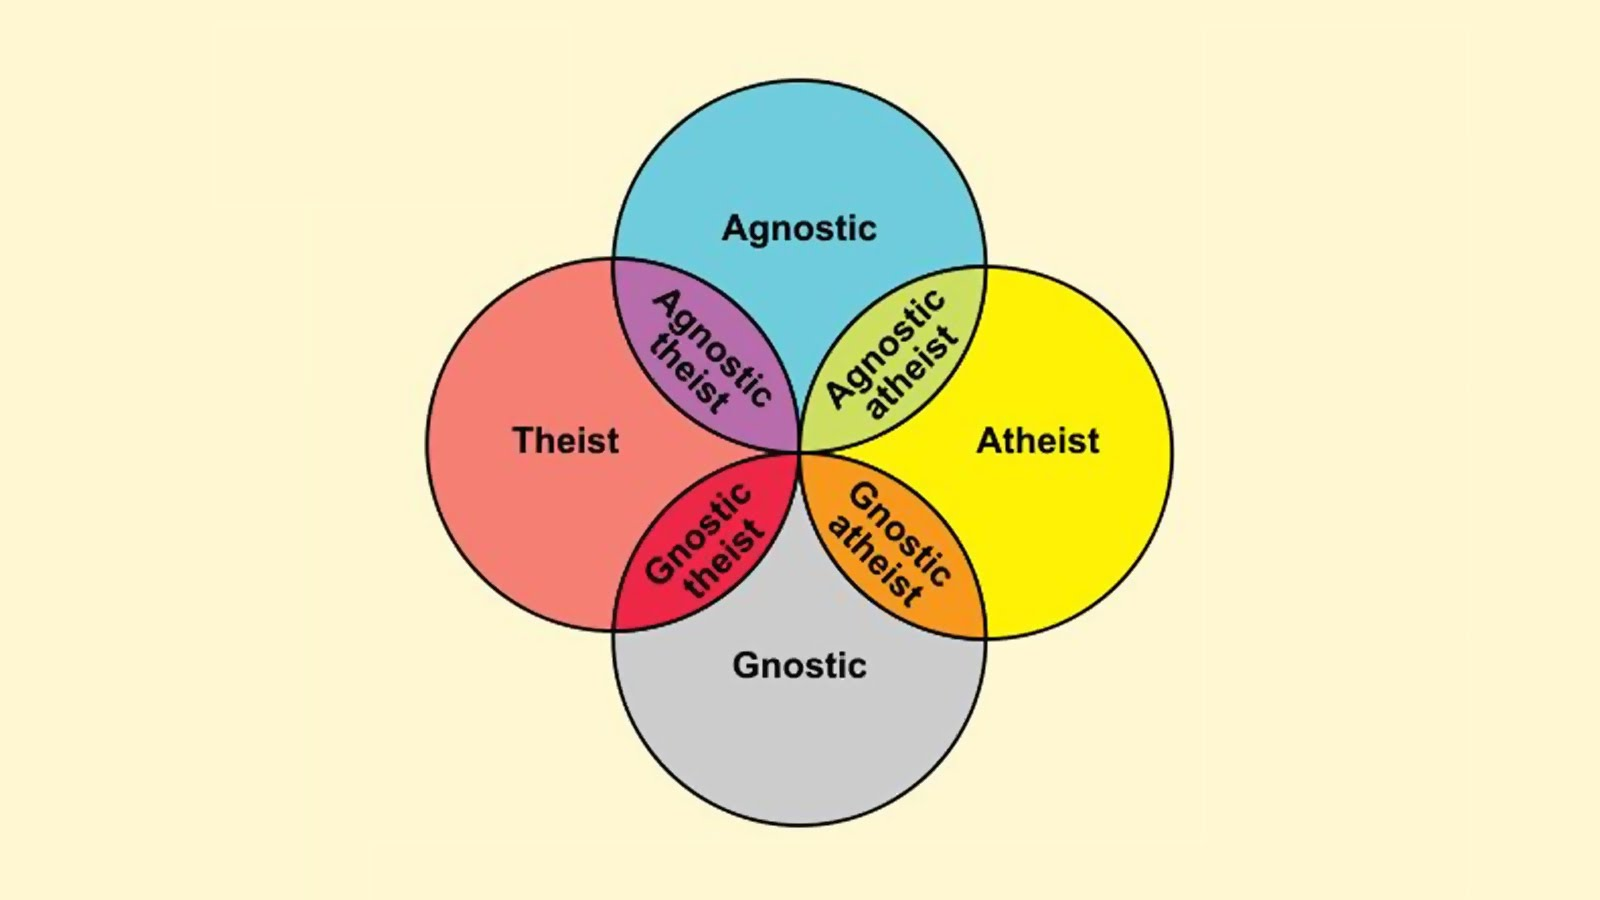 Agnostics are atheist.